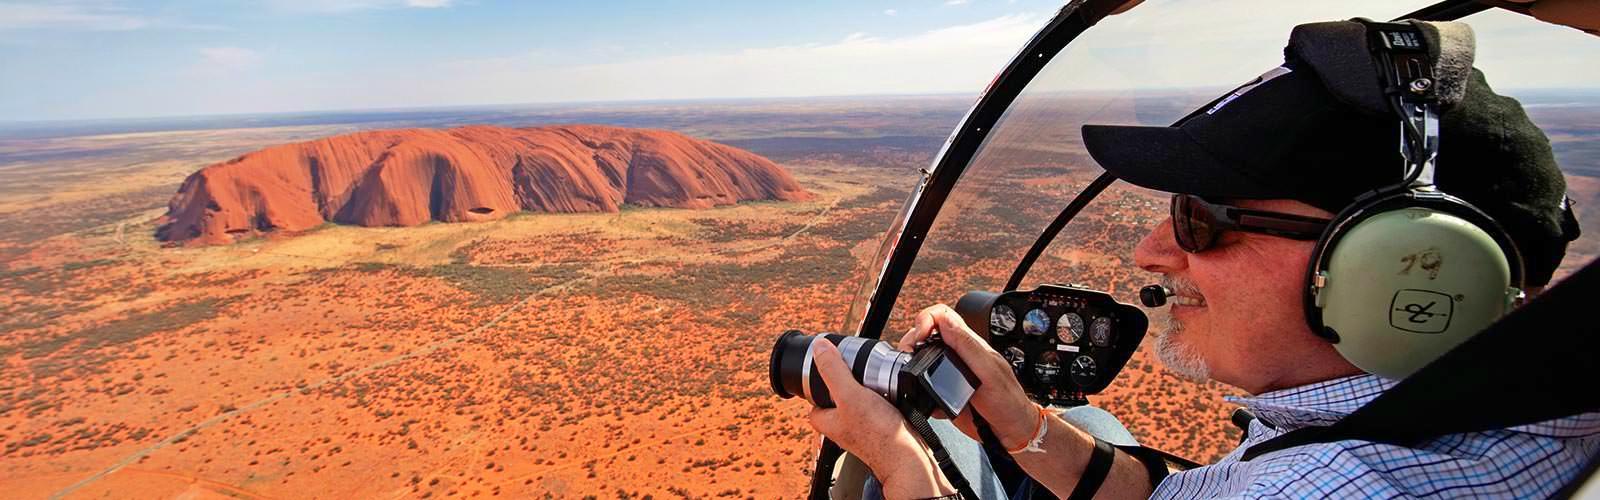 Best Time to Visit Uluru/Ayers Rock Northern Territory